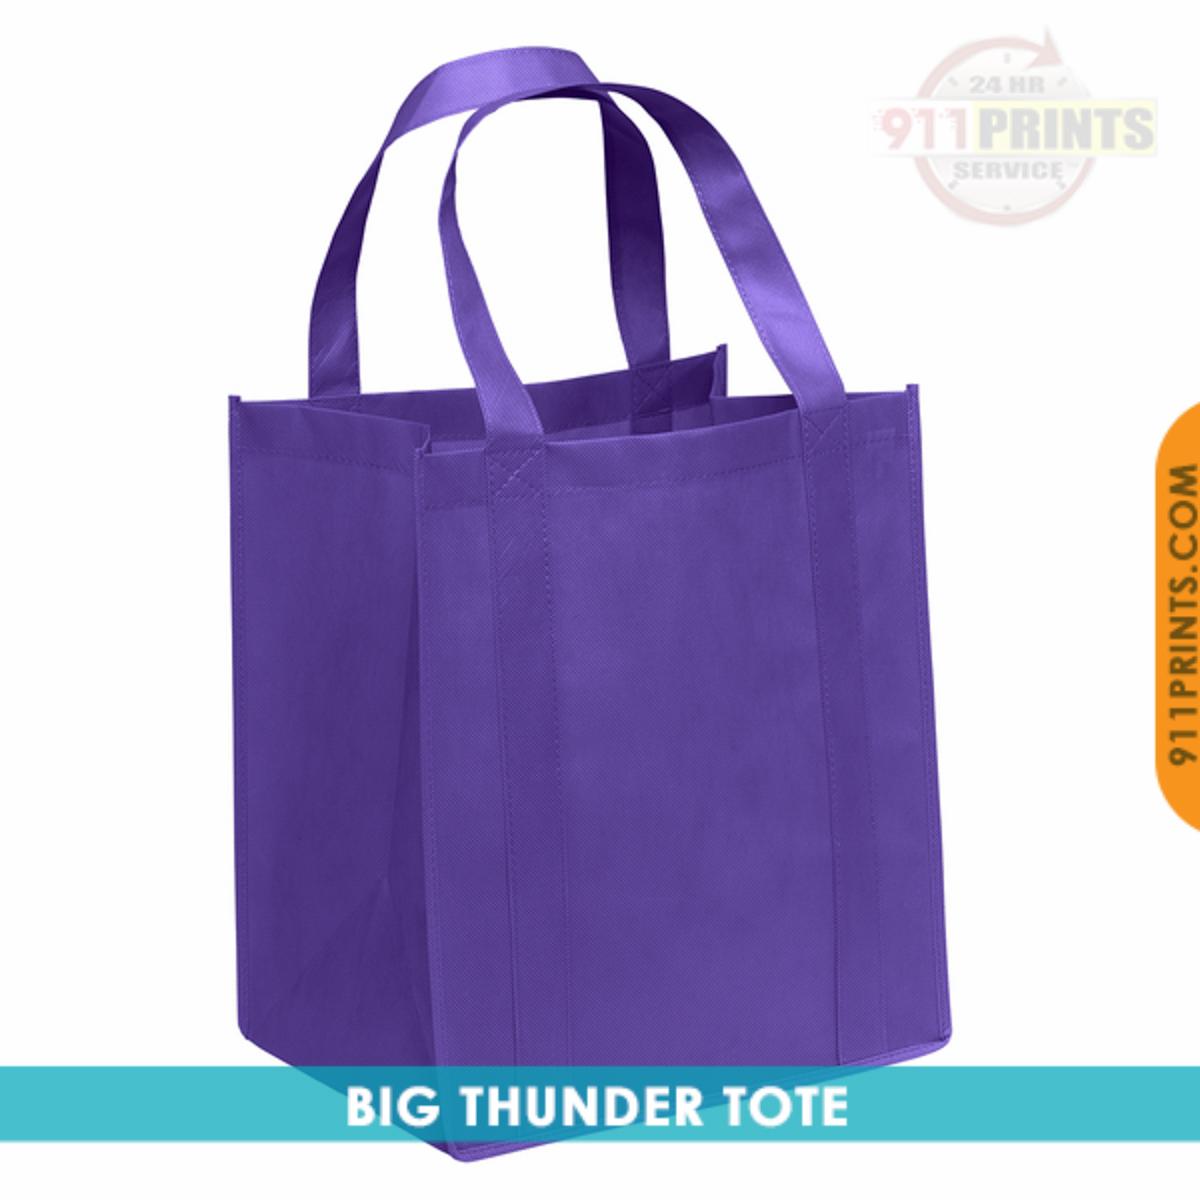 Big Thunder Tote - 911Prints || 24hr Printing & Marketing